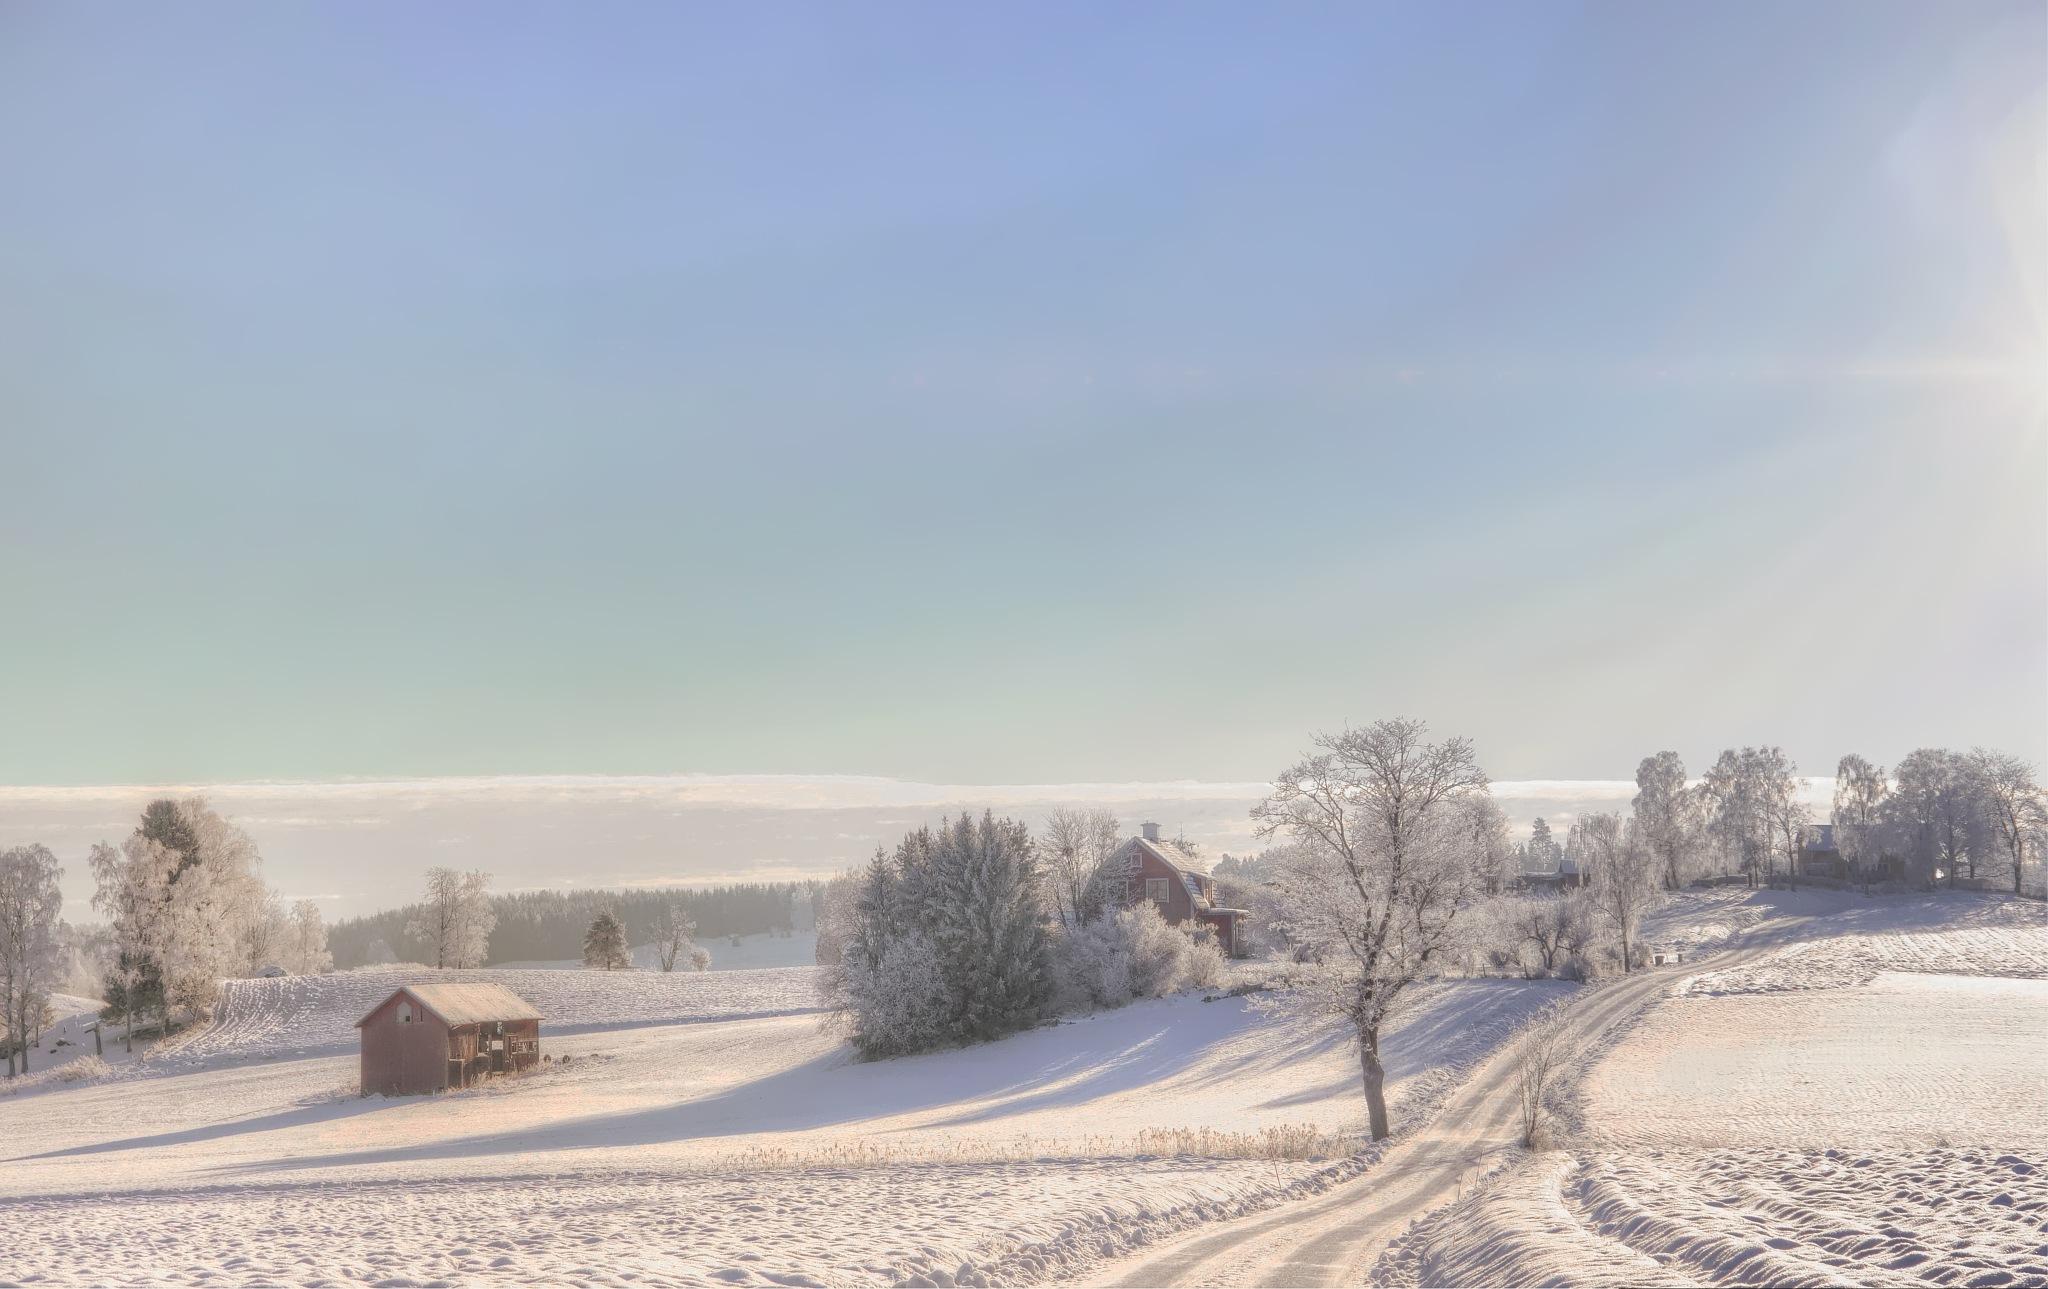 The Village in Winter by rockorbach